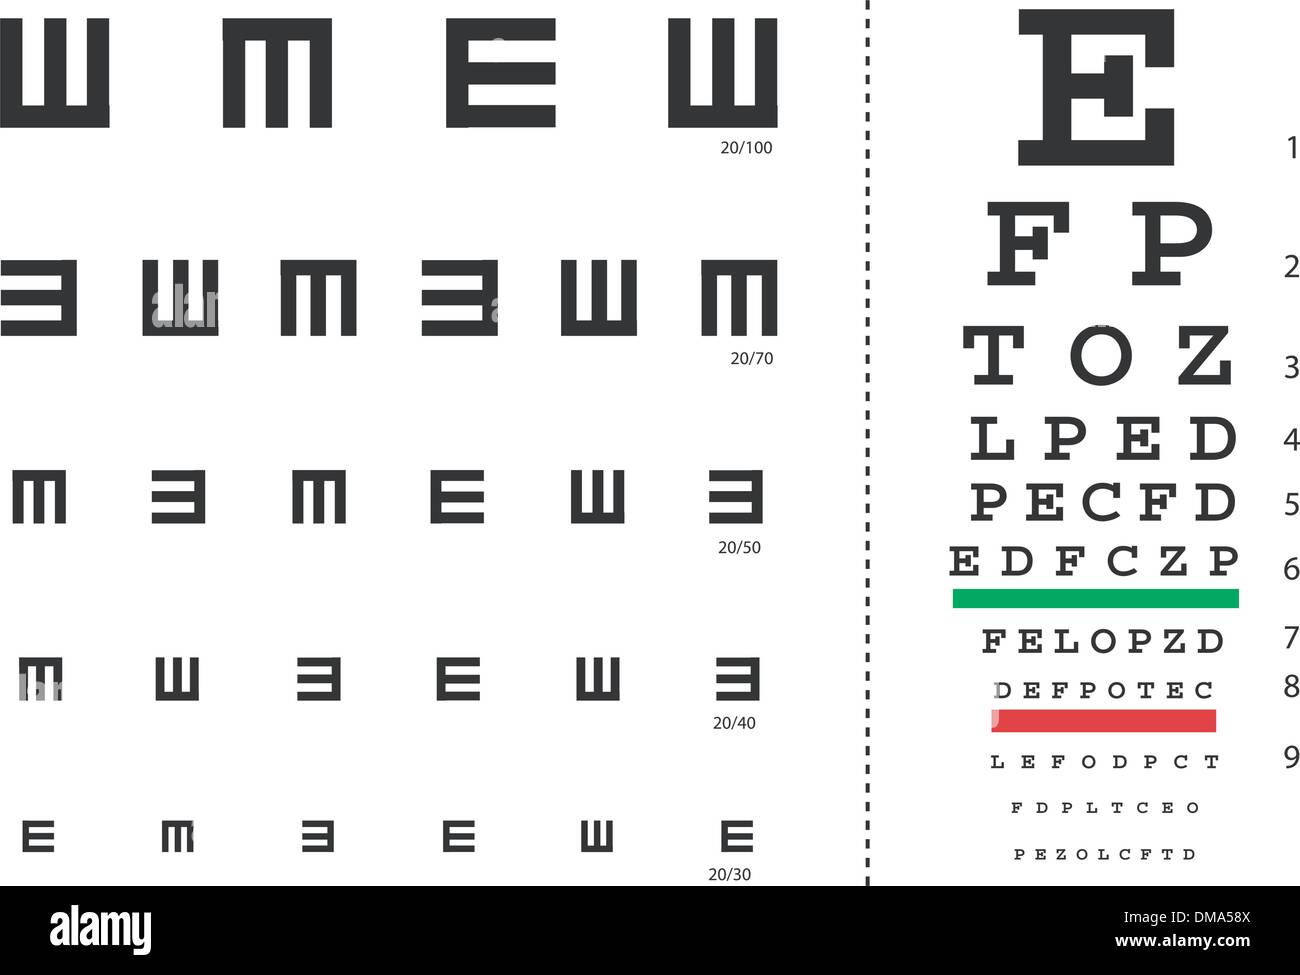 aa73c78a39 Eye Exam Chart Imágenes De Stock & Eye Exam Chart Fotos De Stock - Alamy